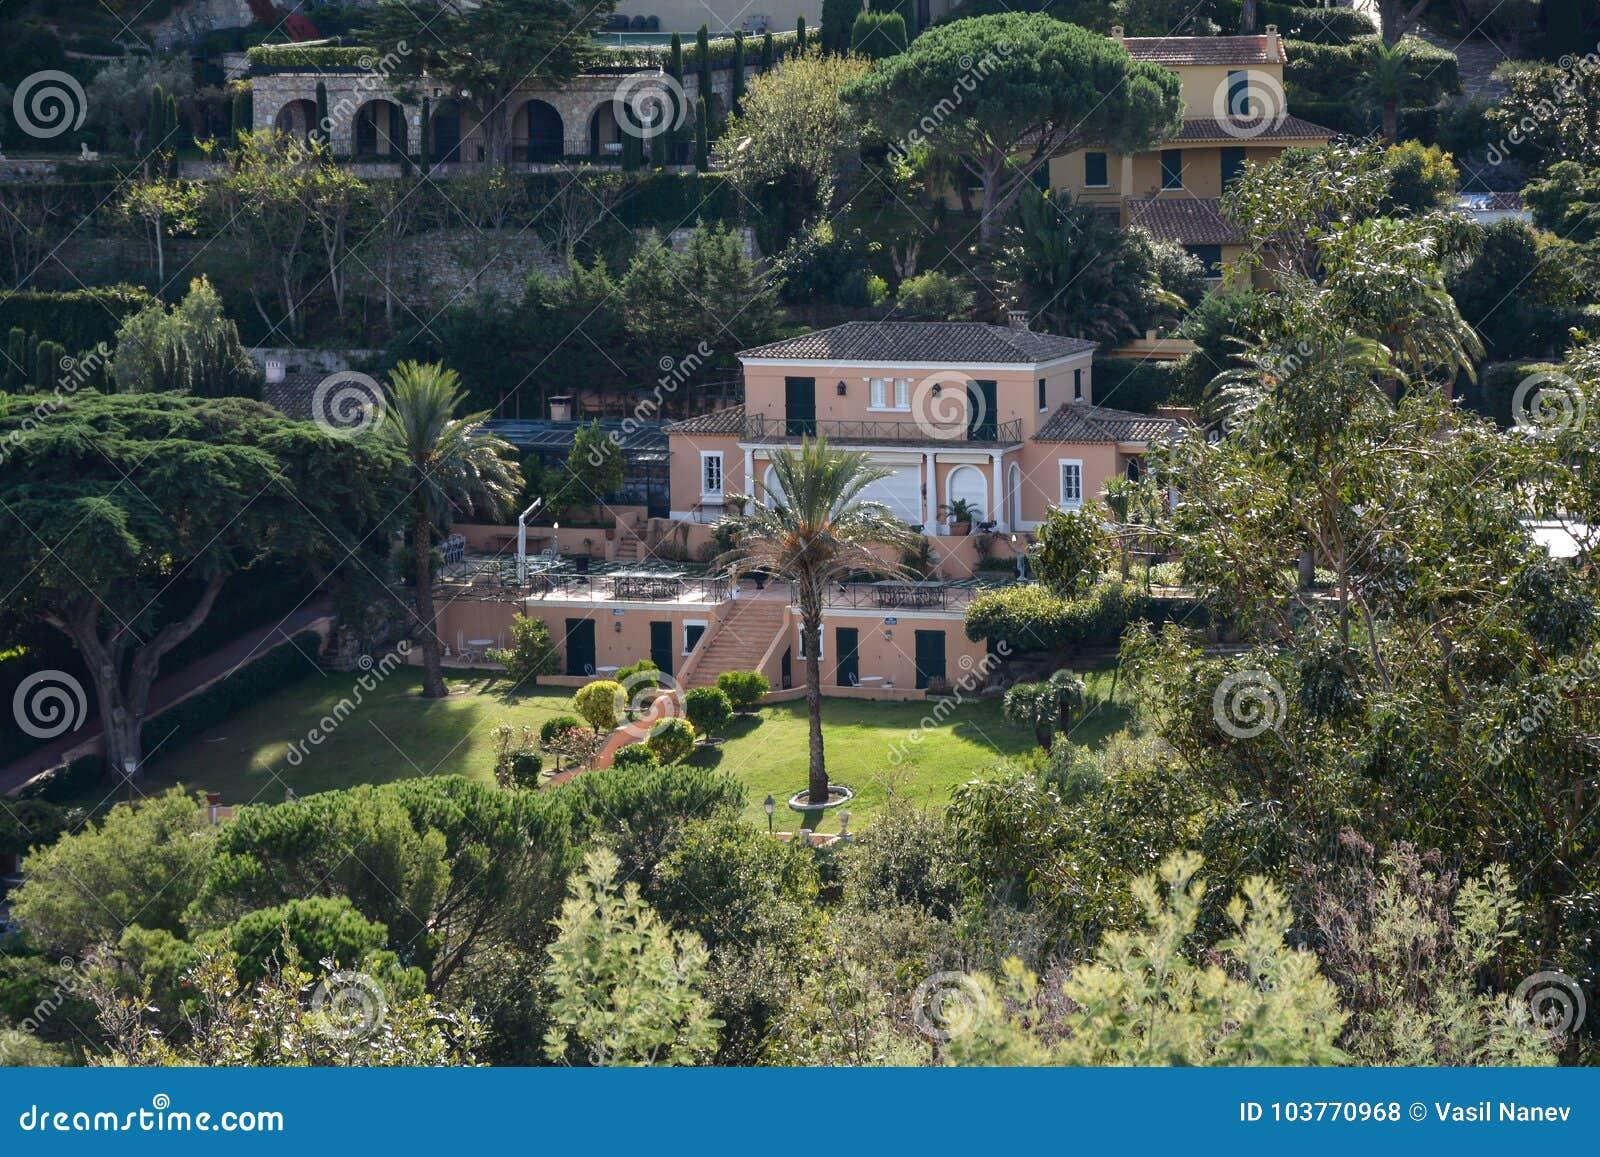 Luxury house in Saint-Tropez